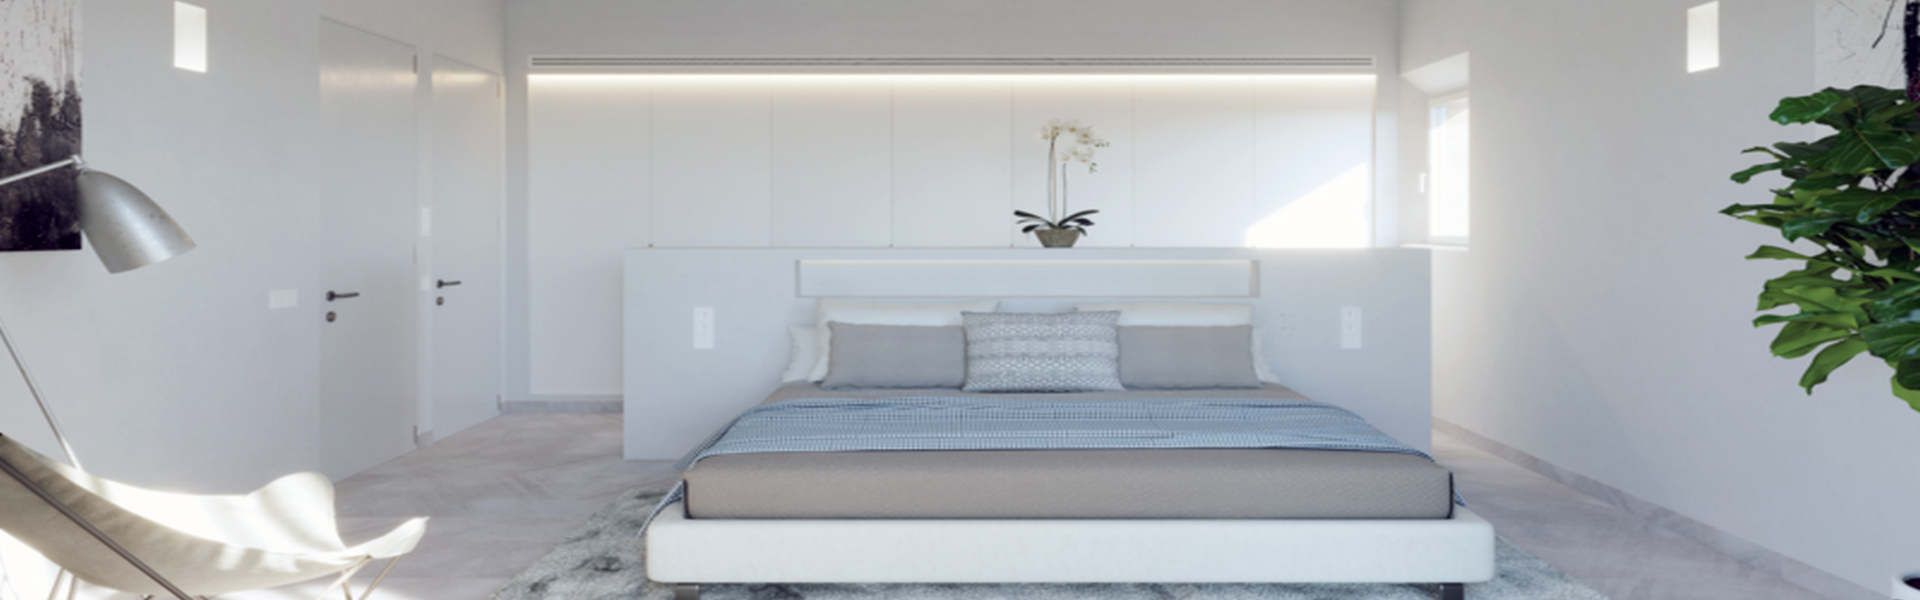 Campos - Elegant new construction finca for sale